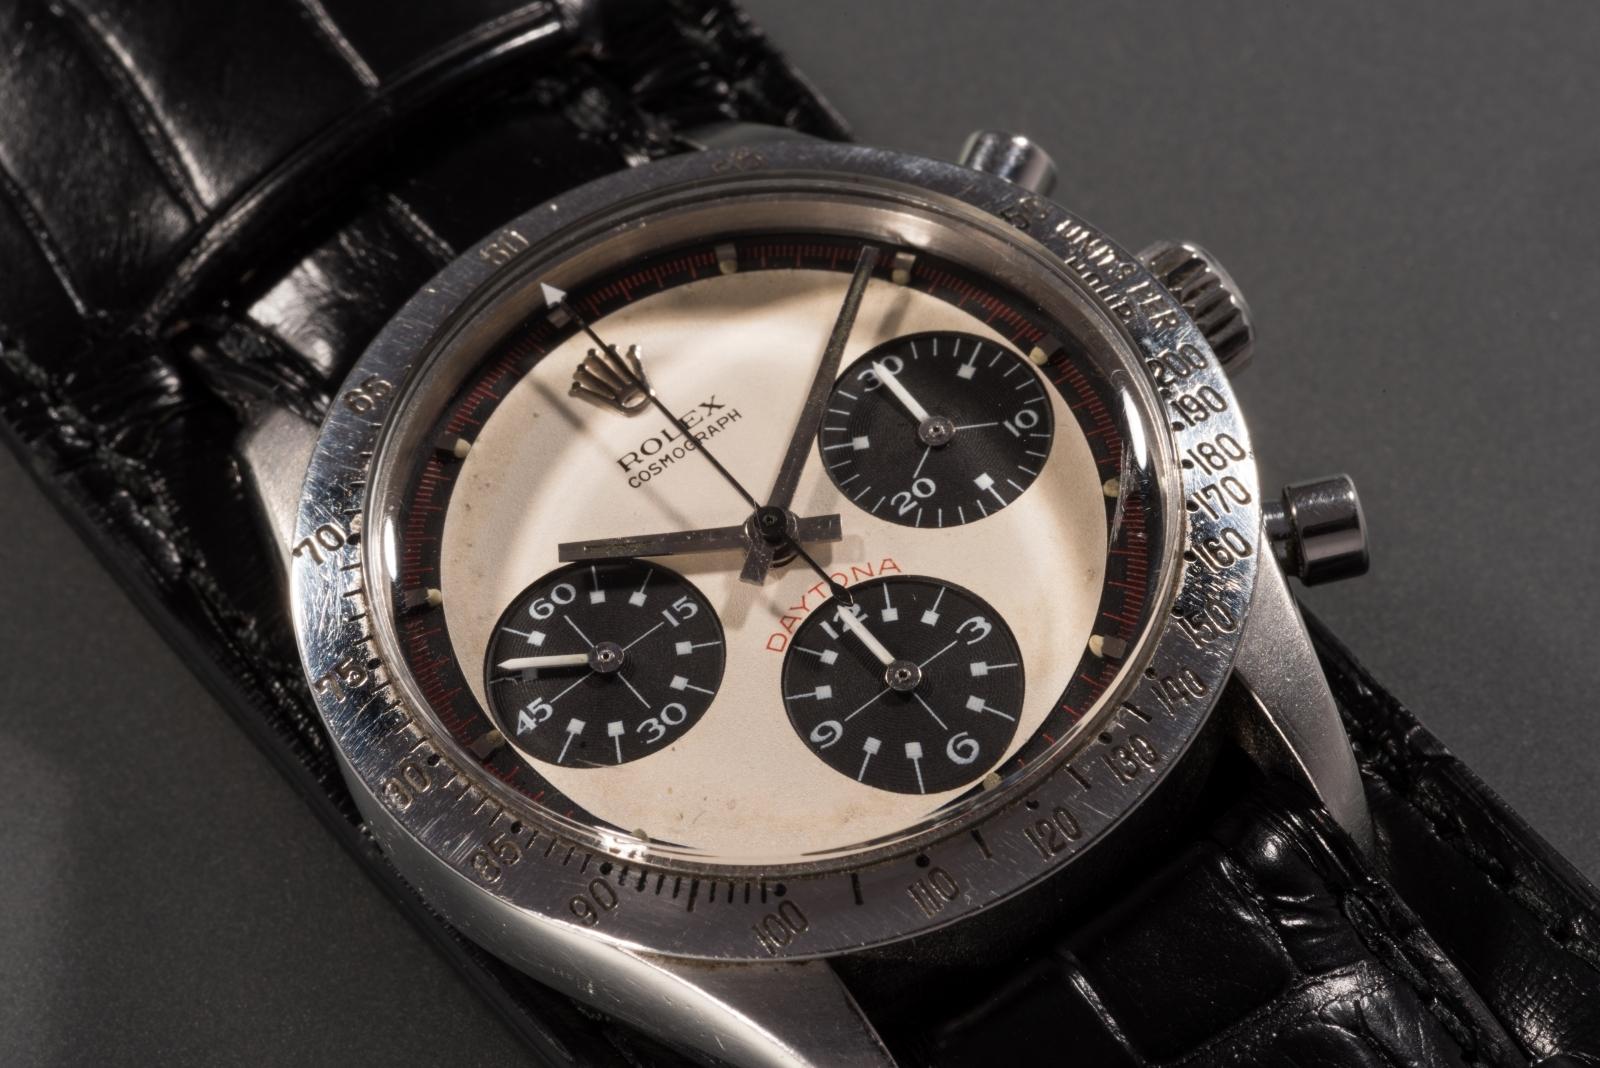 Paul Newman Daytona Rolex